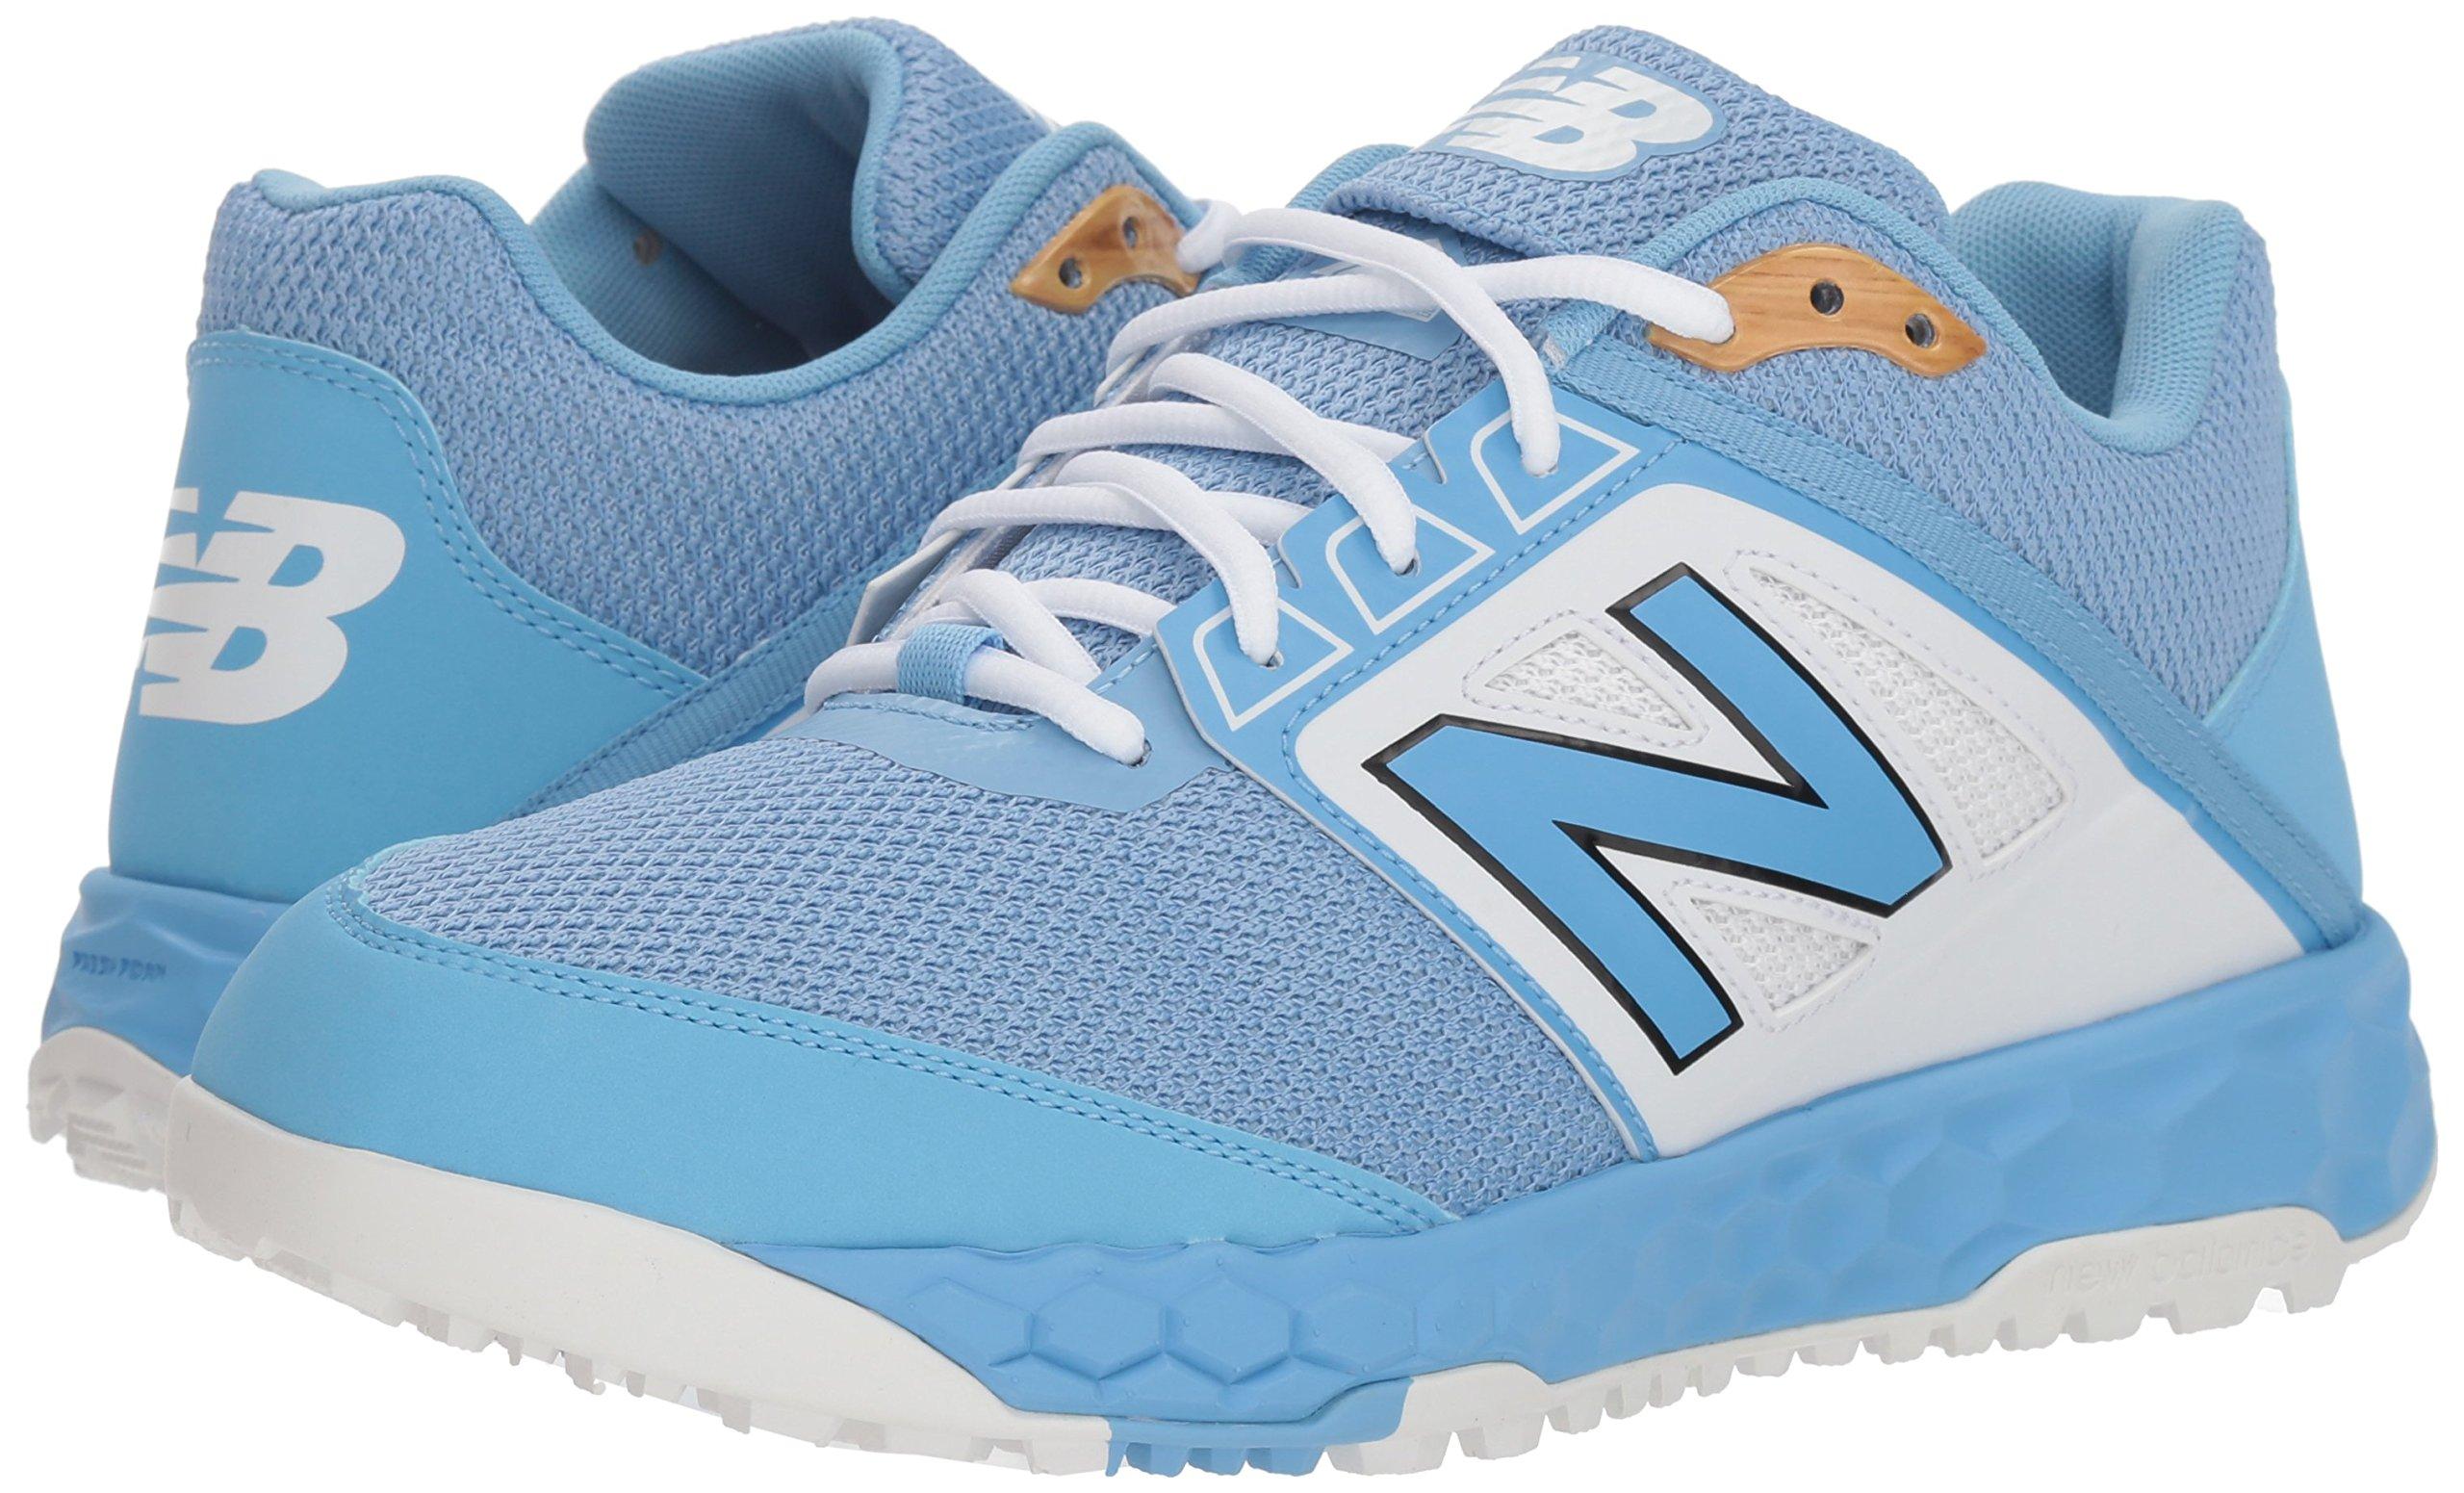 New Balance Men's 3000v4 Turf Baseball Shoe, Light Blue, 5 D US by New Balance (Image #5)